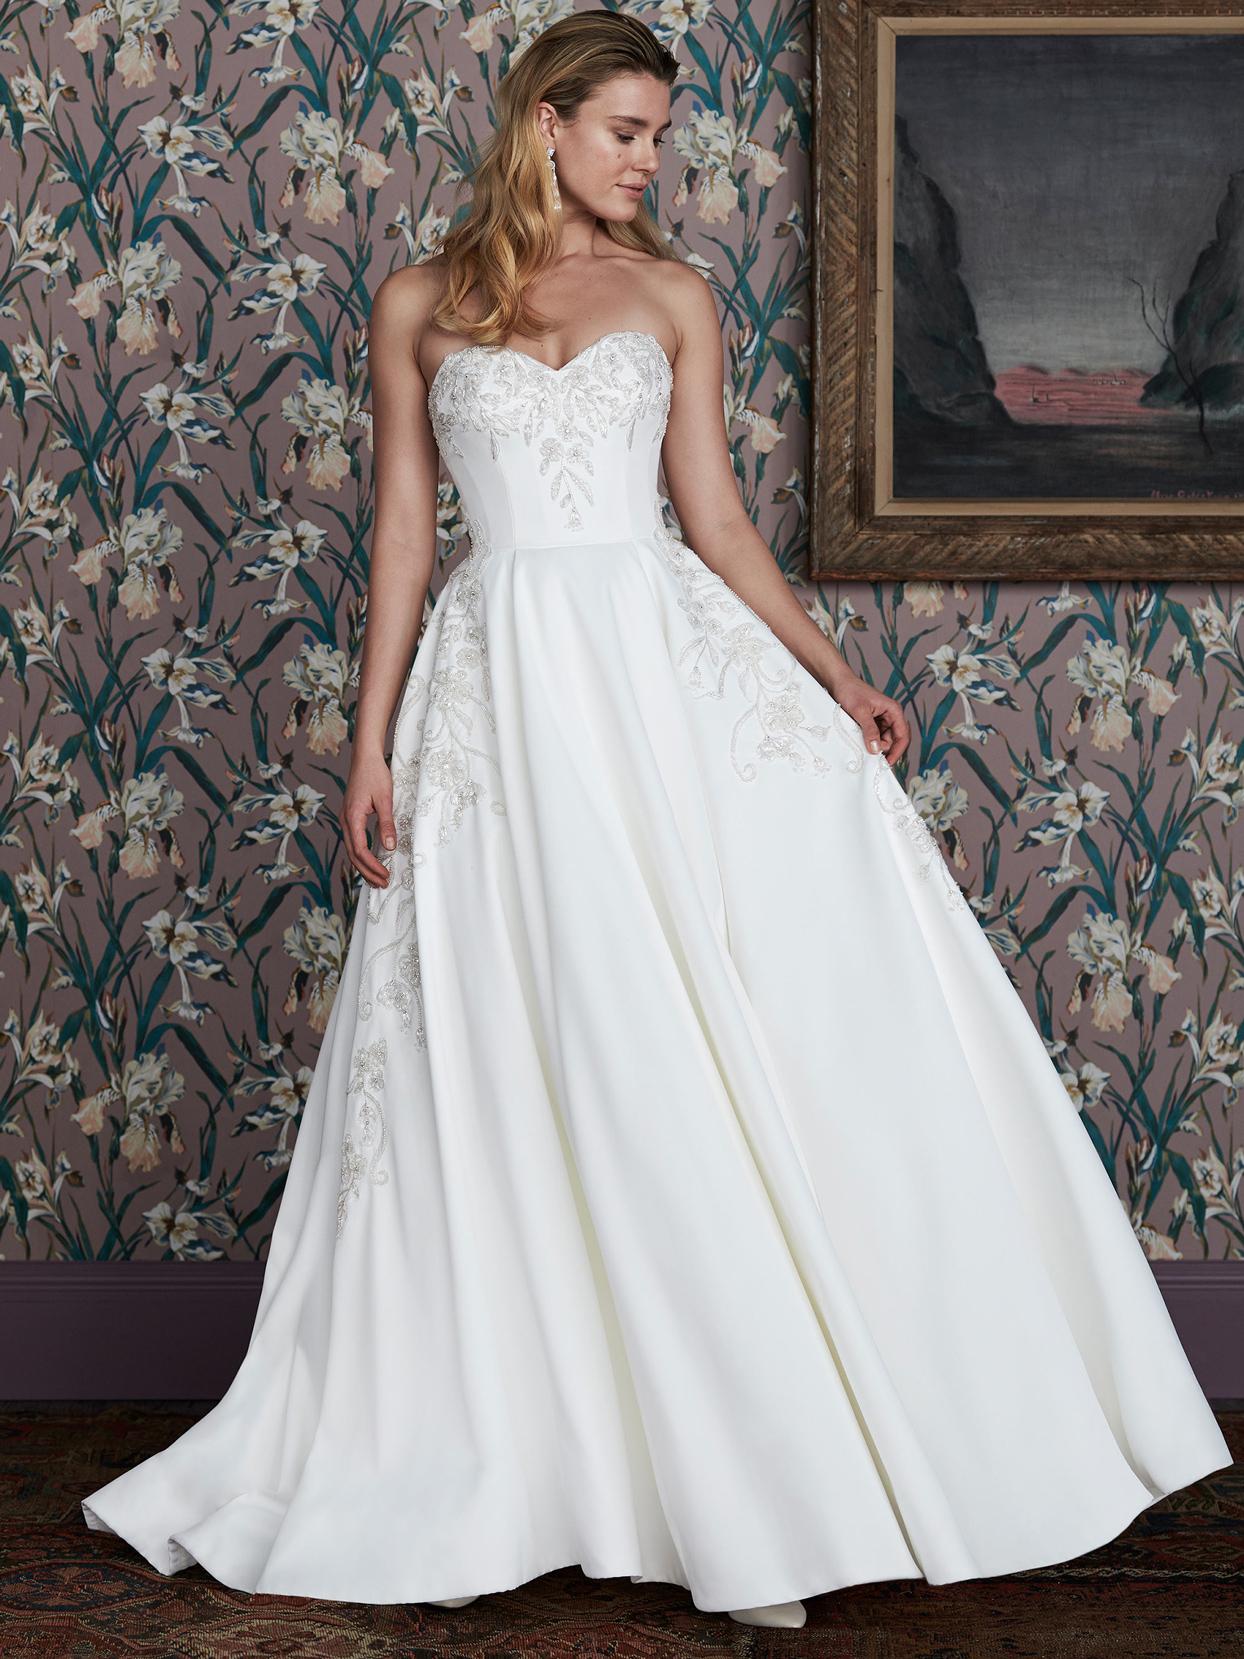 justin alexander sweetheart neckline a-line wedding dress spring 2021